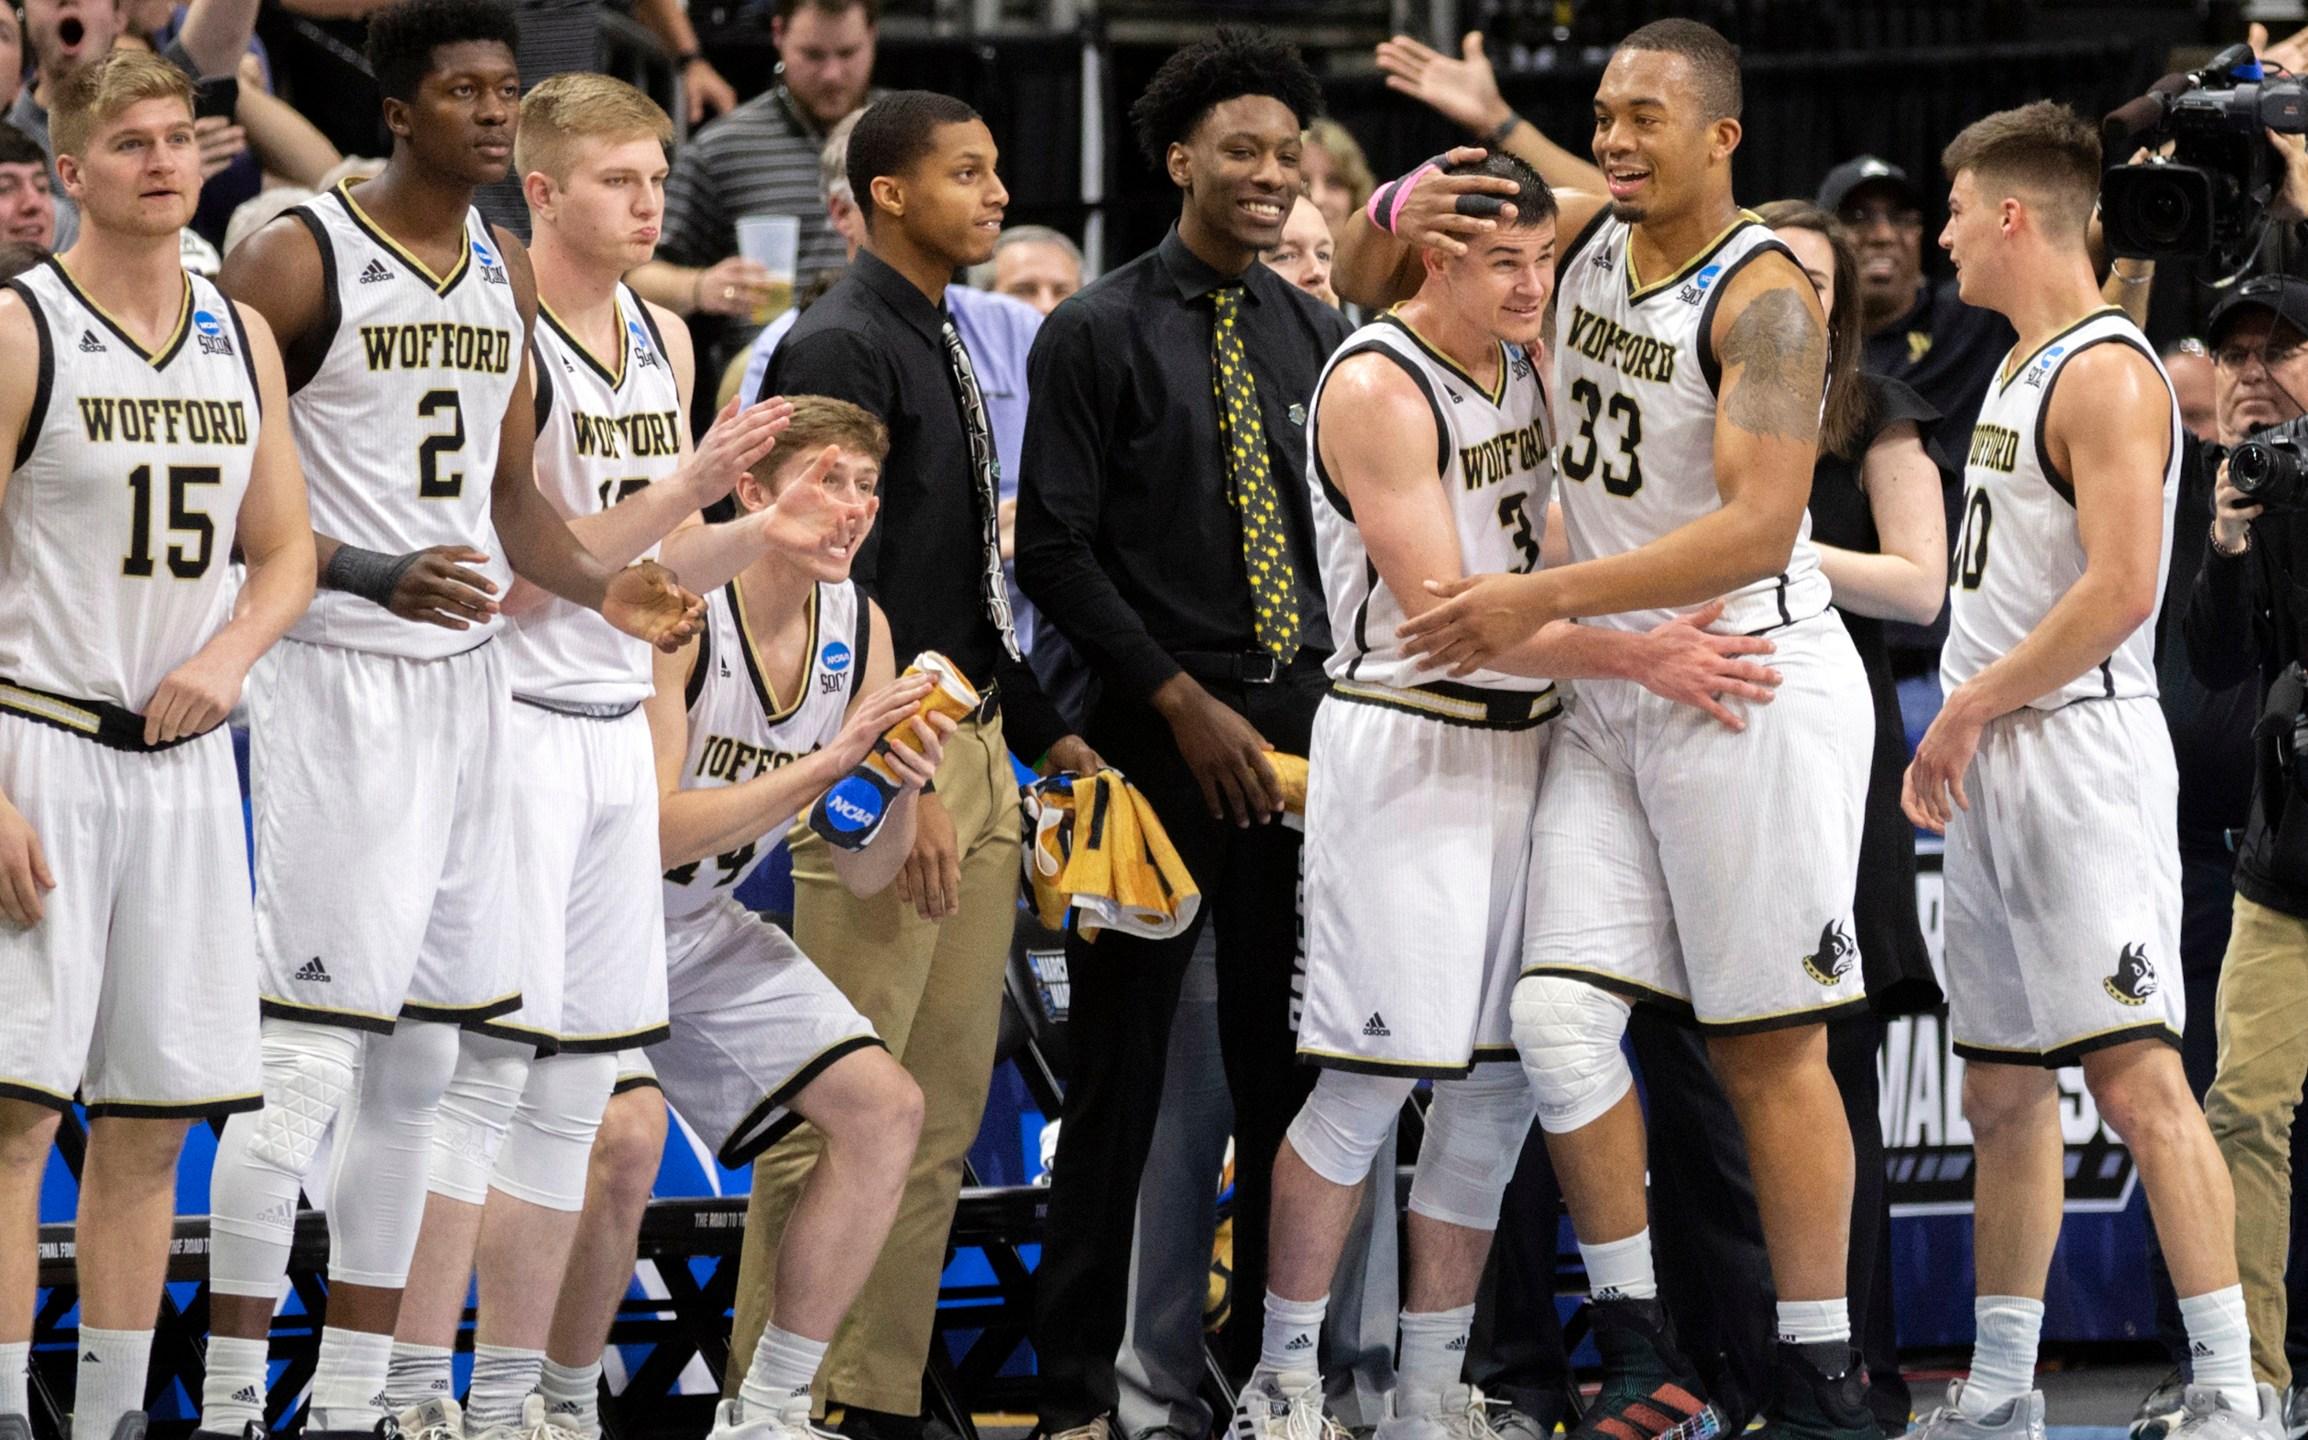 NCAA Seton Hall Wofford Basketball_1553250128689